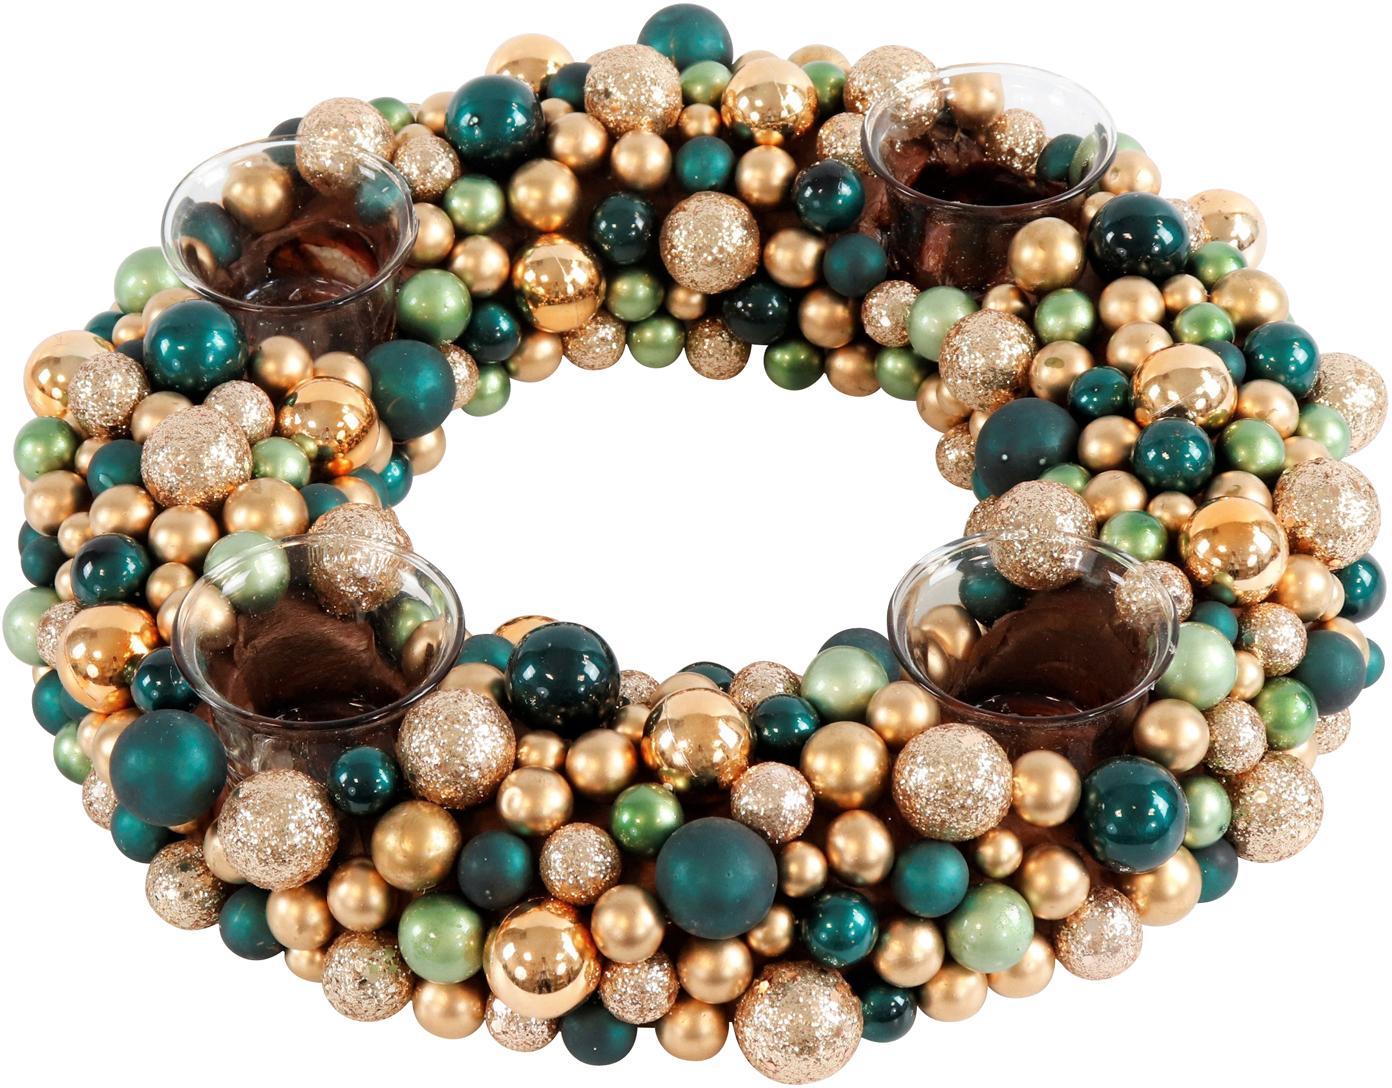 Corona de Adviento Festivity, Plástico, espuma de poliestireno, Verde, dorado, Ø 33 x Al 8 cm